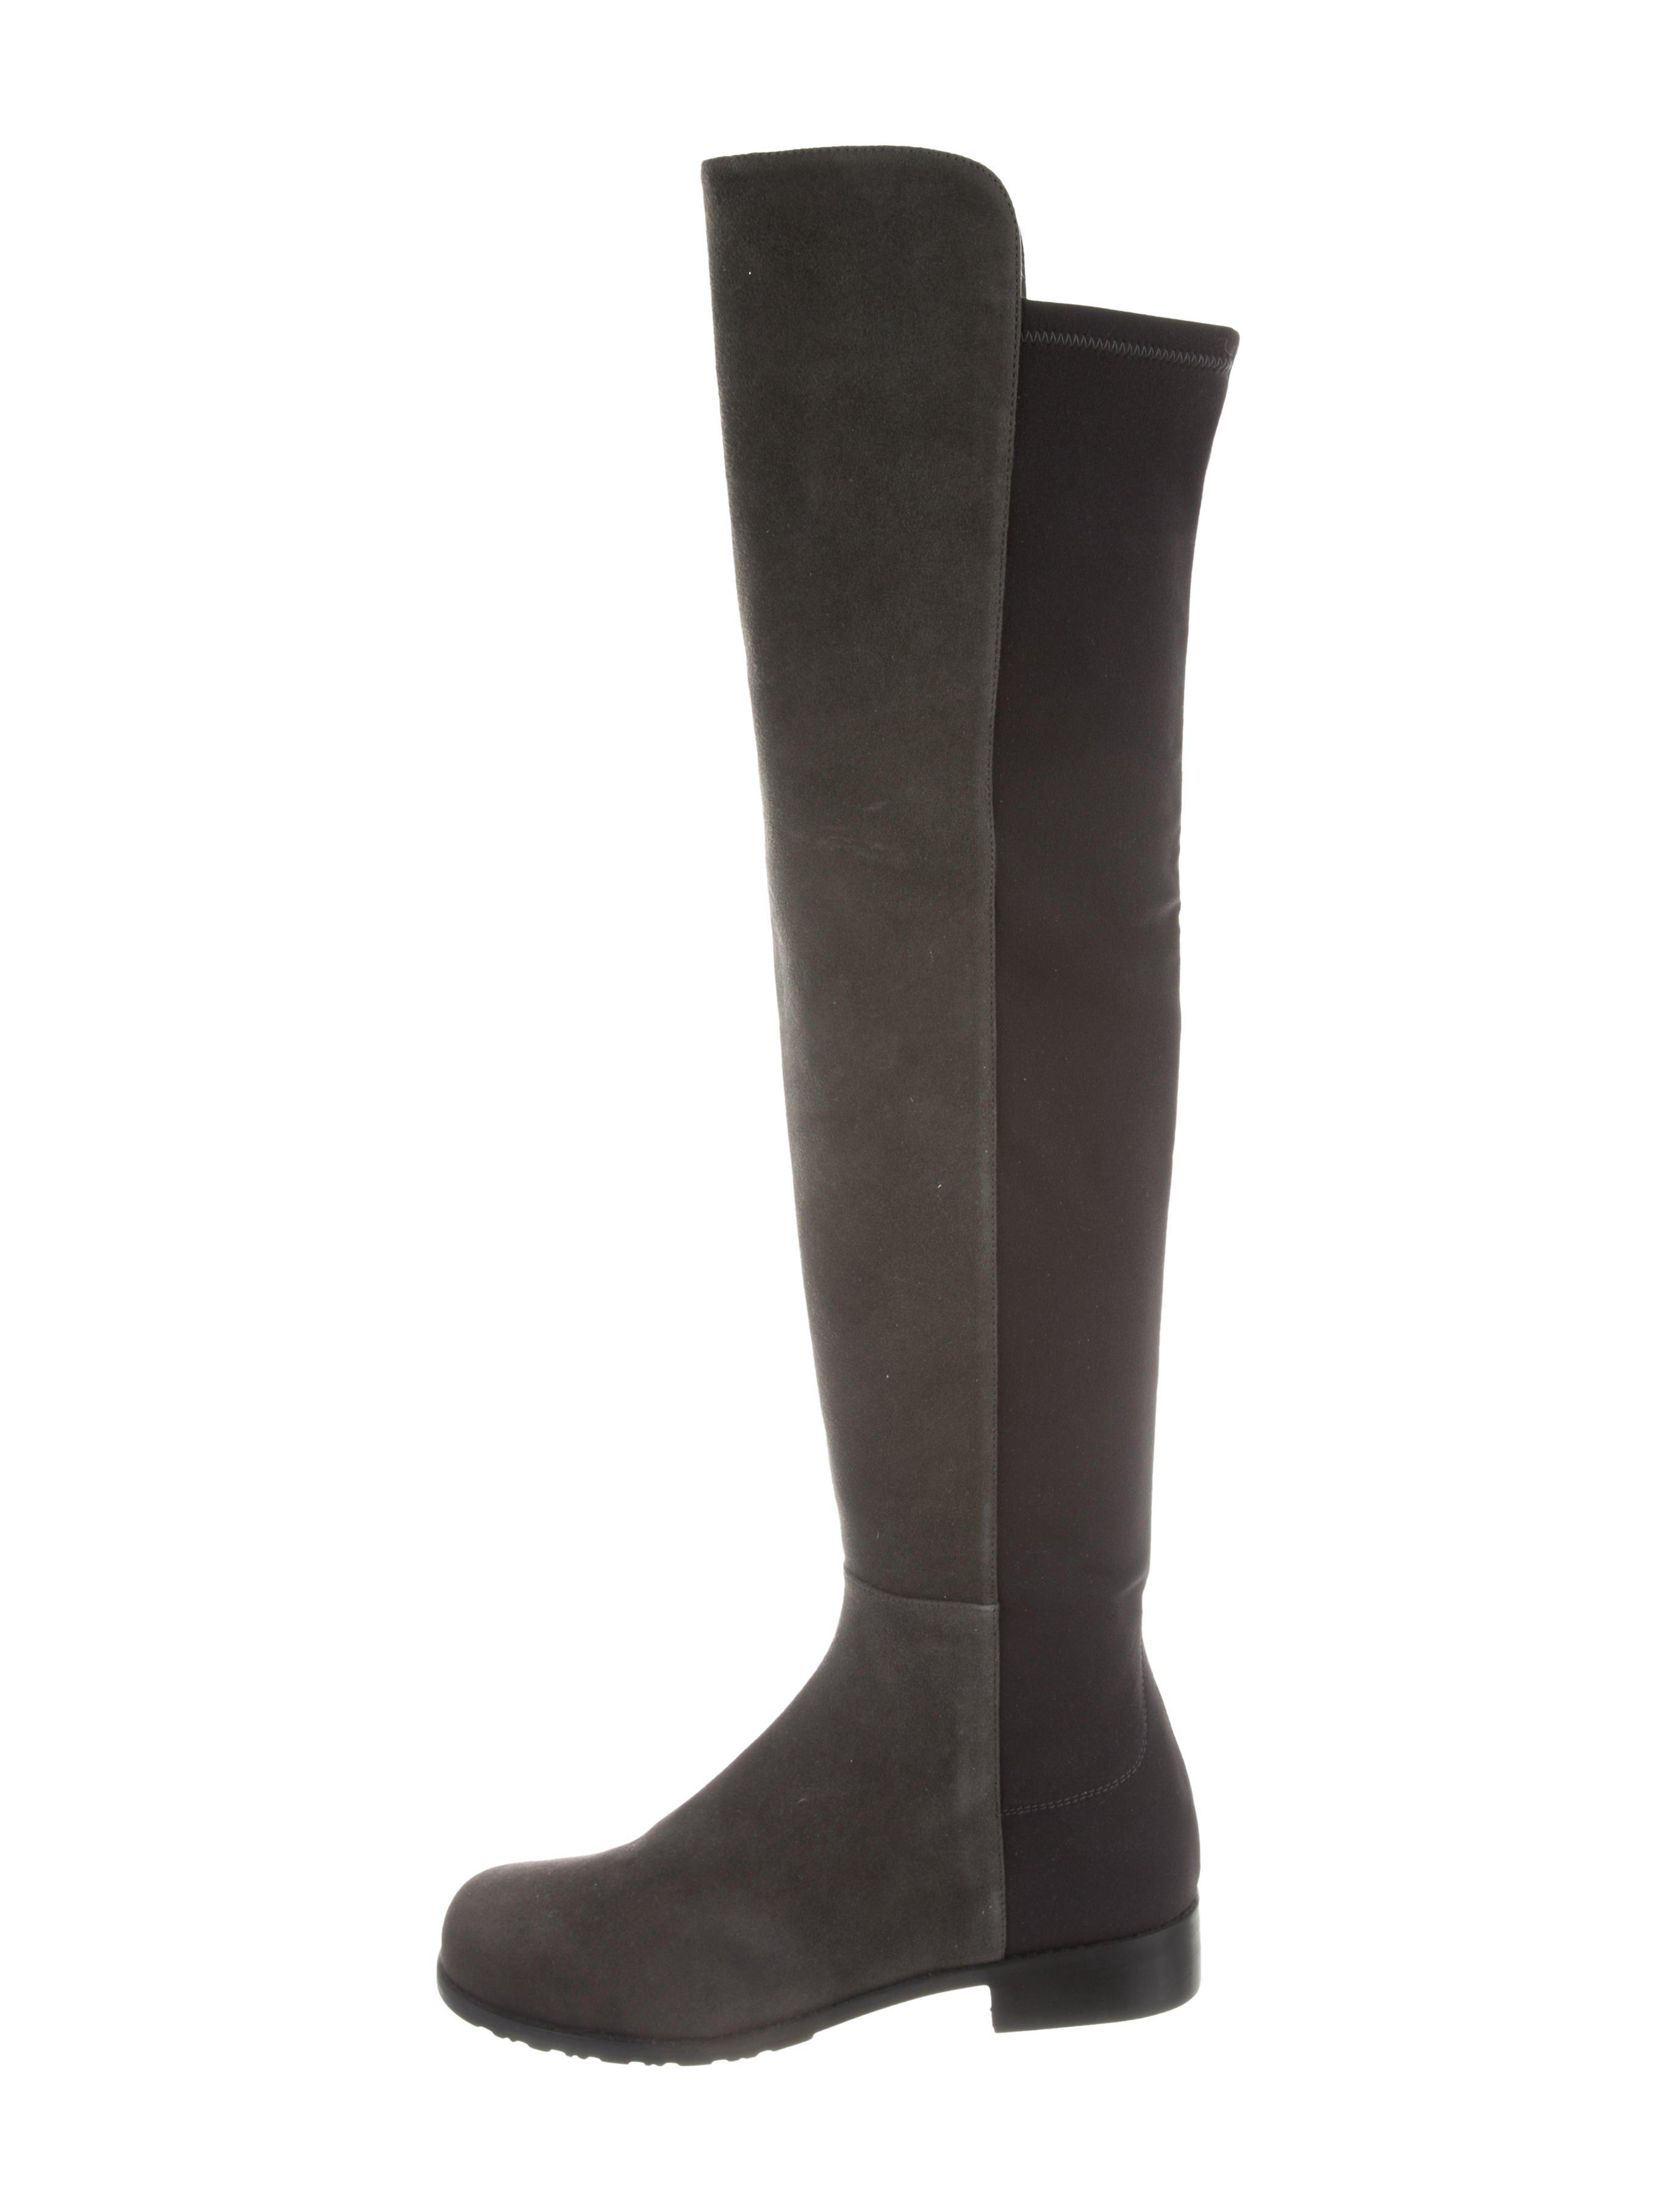 Stuart Weitzman 5050 Over-The-Knee Boots w/ Tags clearance excellent discount footlocker nRGjZV2tLk